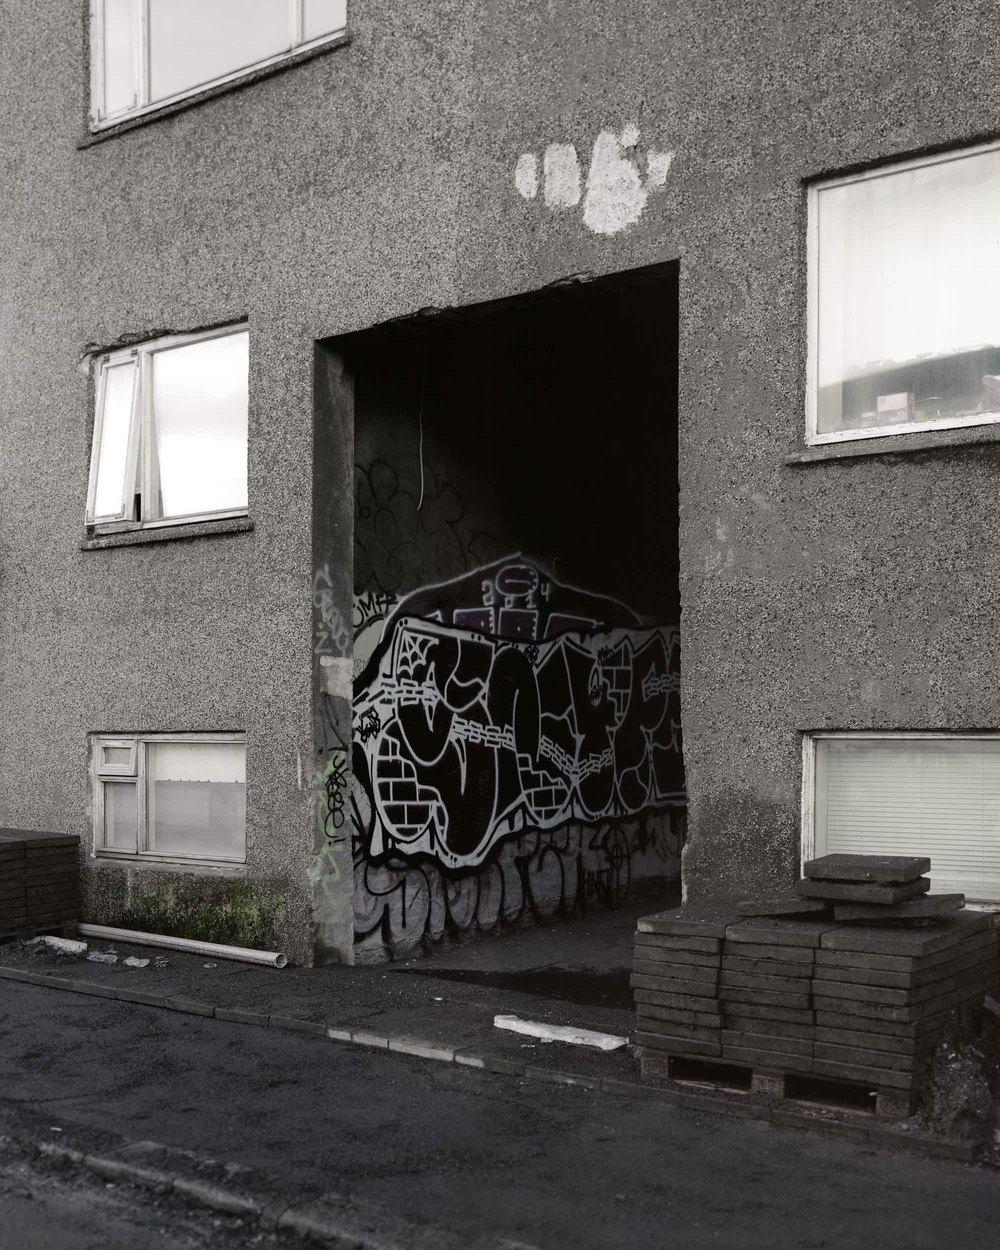 Grettisgata Alleyway, Reykjavik.jpg